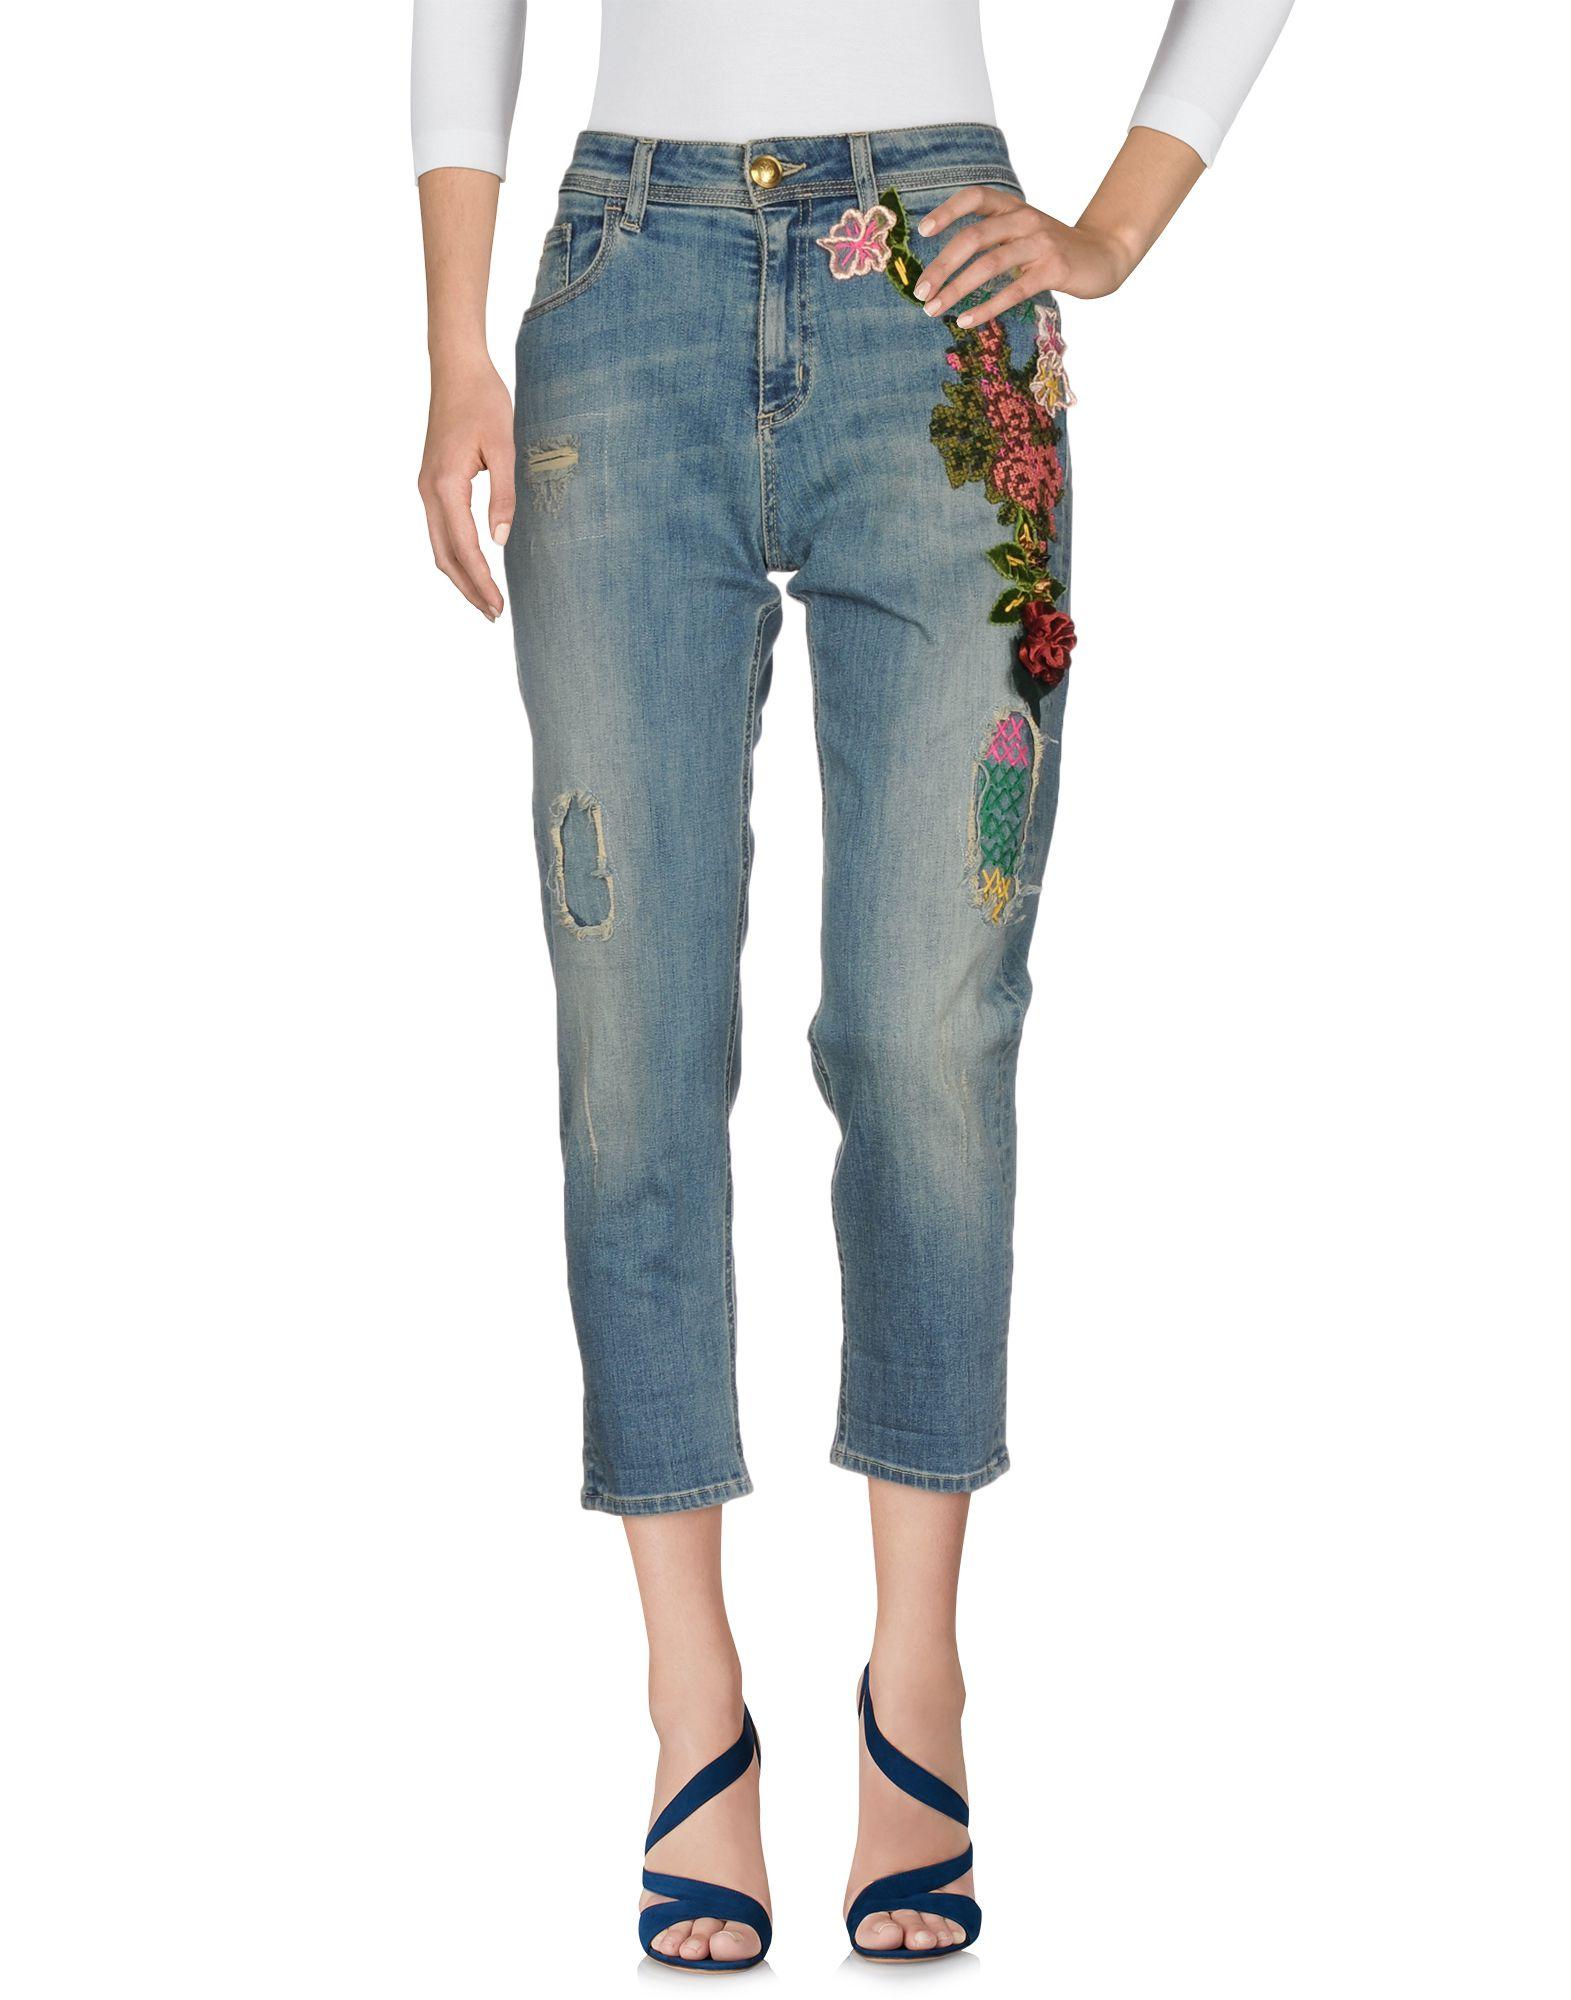 MARANI JEANS Джинсовые брюки summer boyfriend jeans for women hole ripped white lace flowers denim pants low waist mujer vintage skinny stretch jeans female